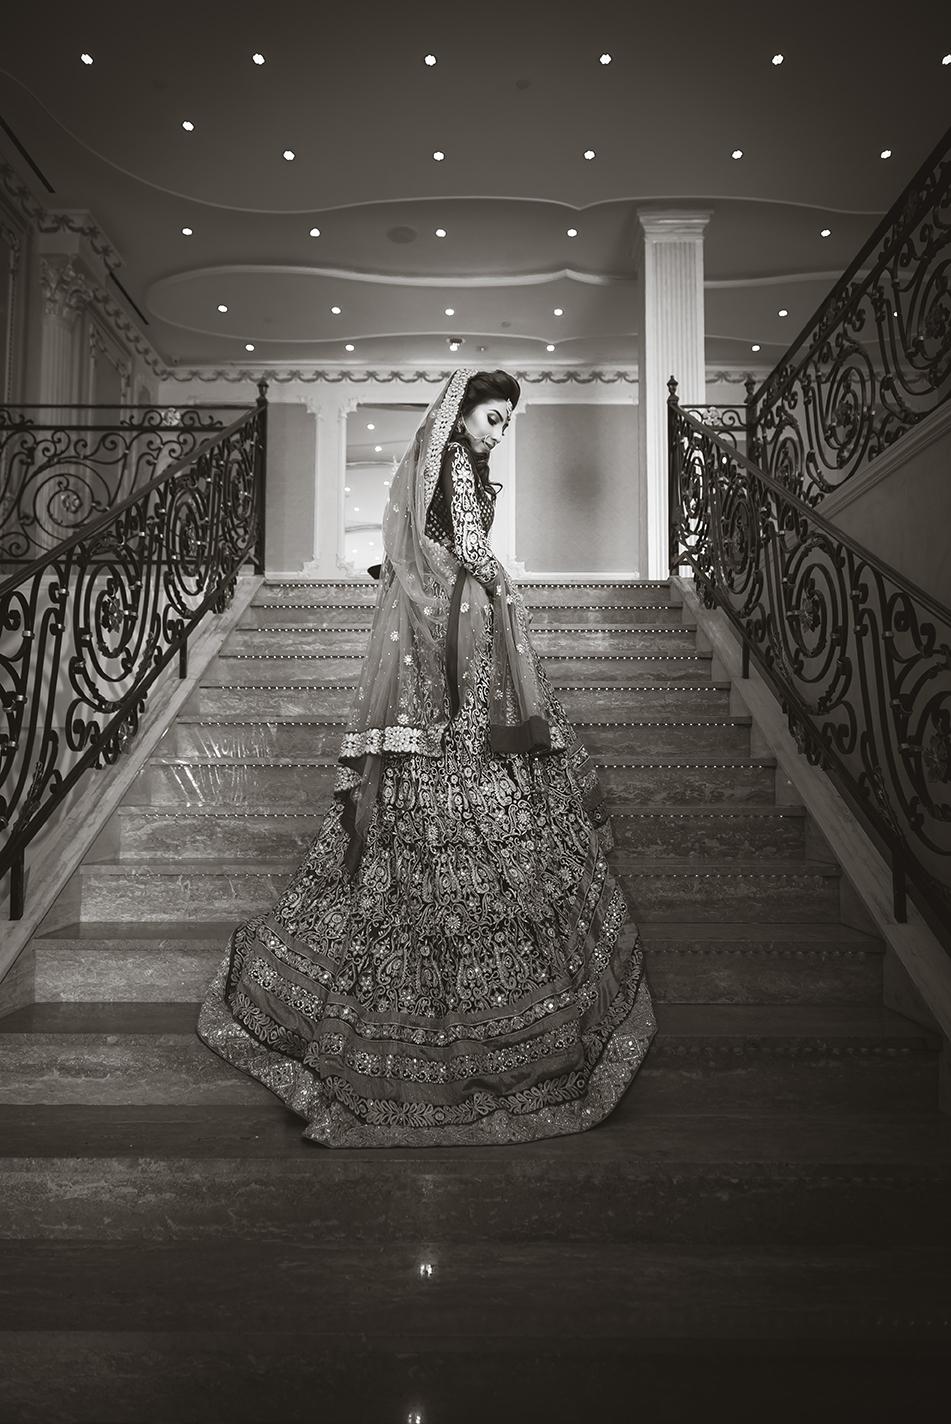 south_asian_wedding_photography_dhoom_studio_new_york4 SOUTH ASIAN WEDDINGS